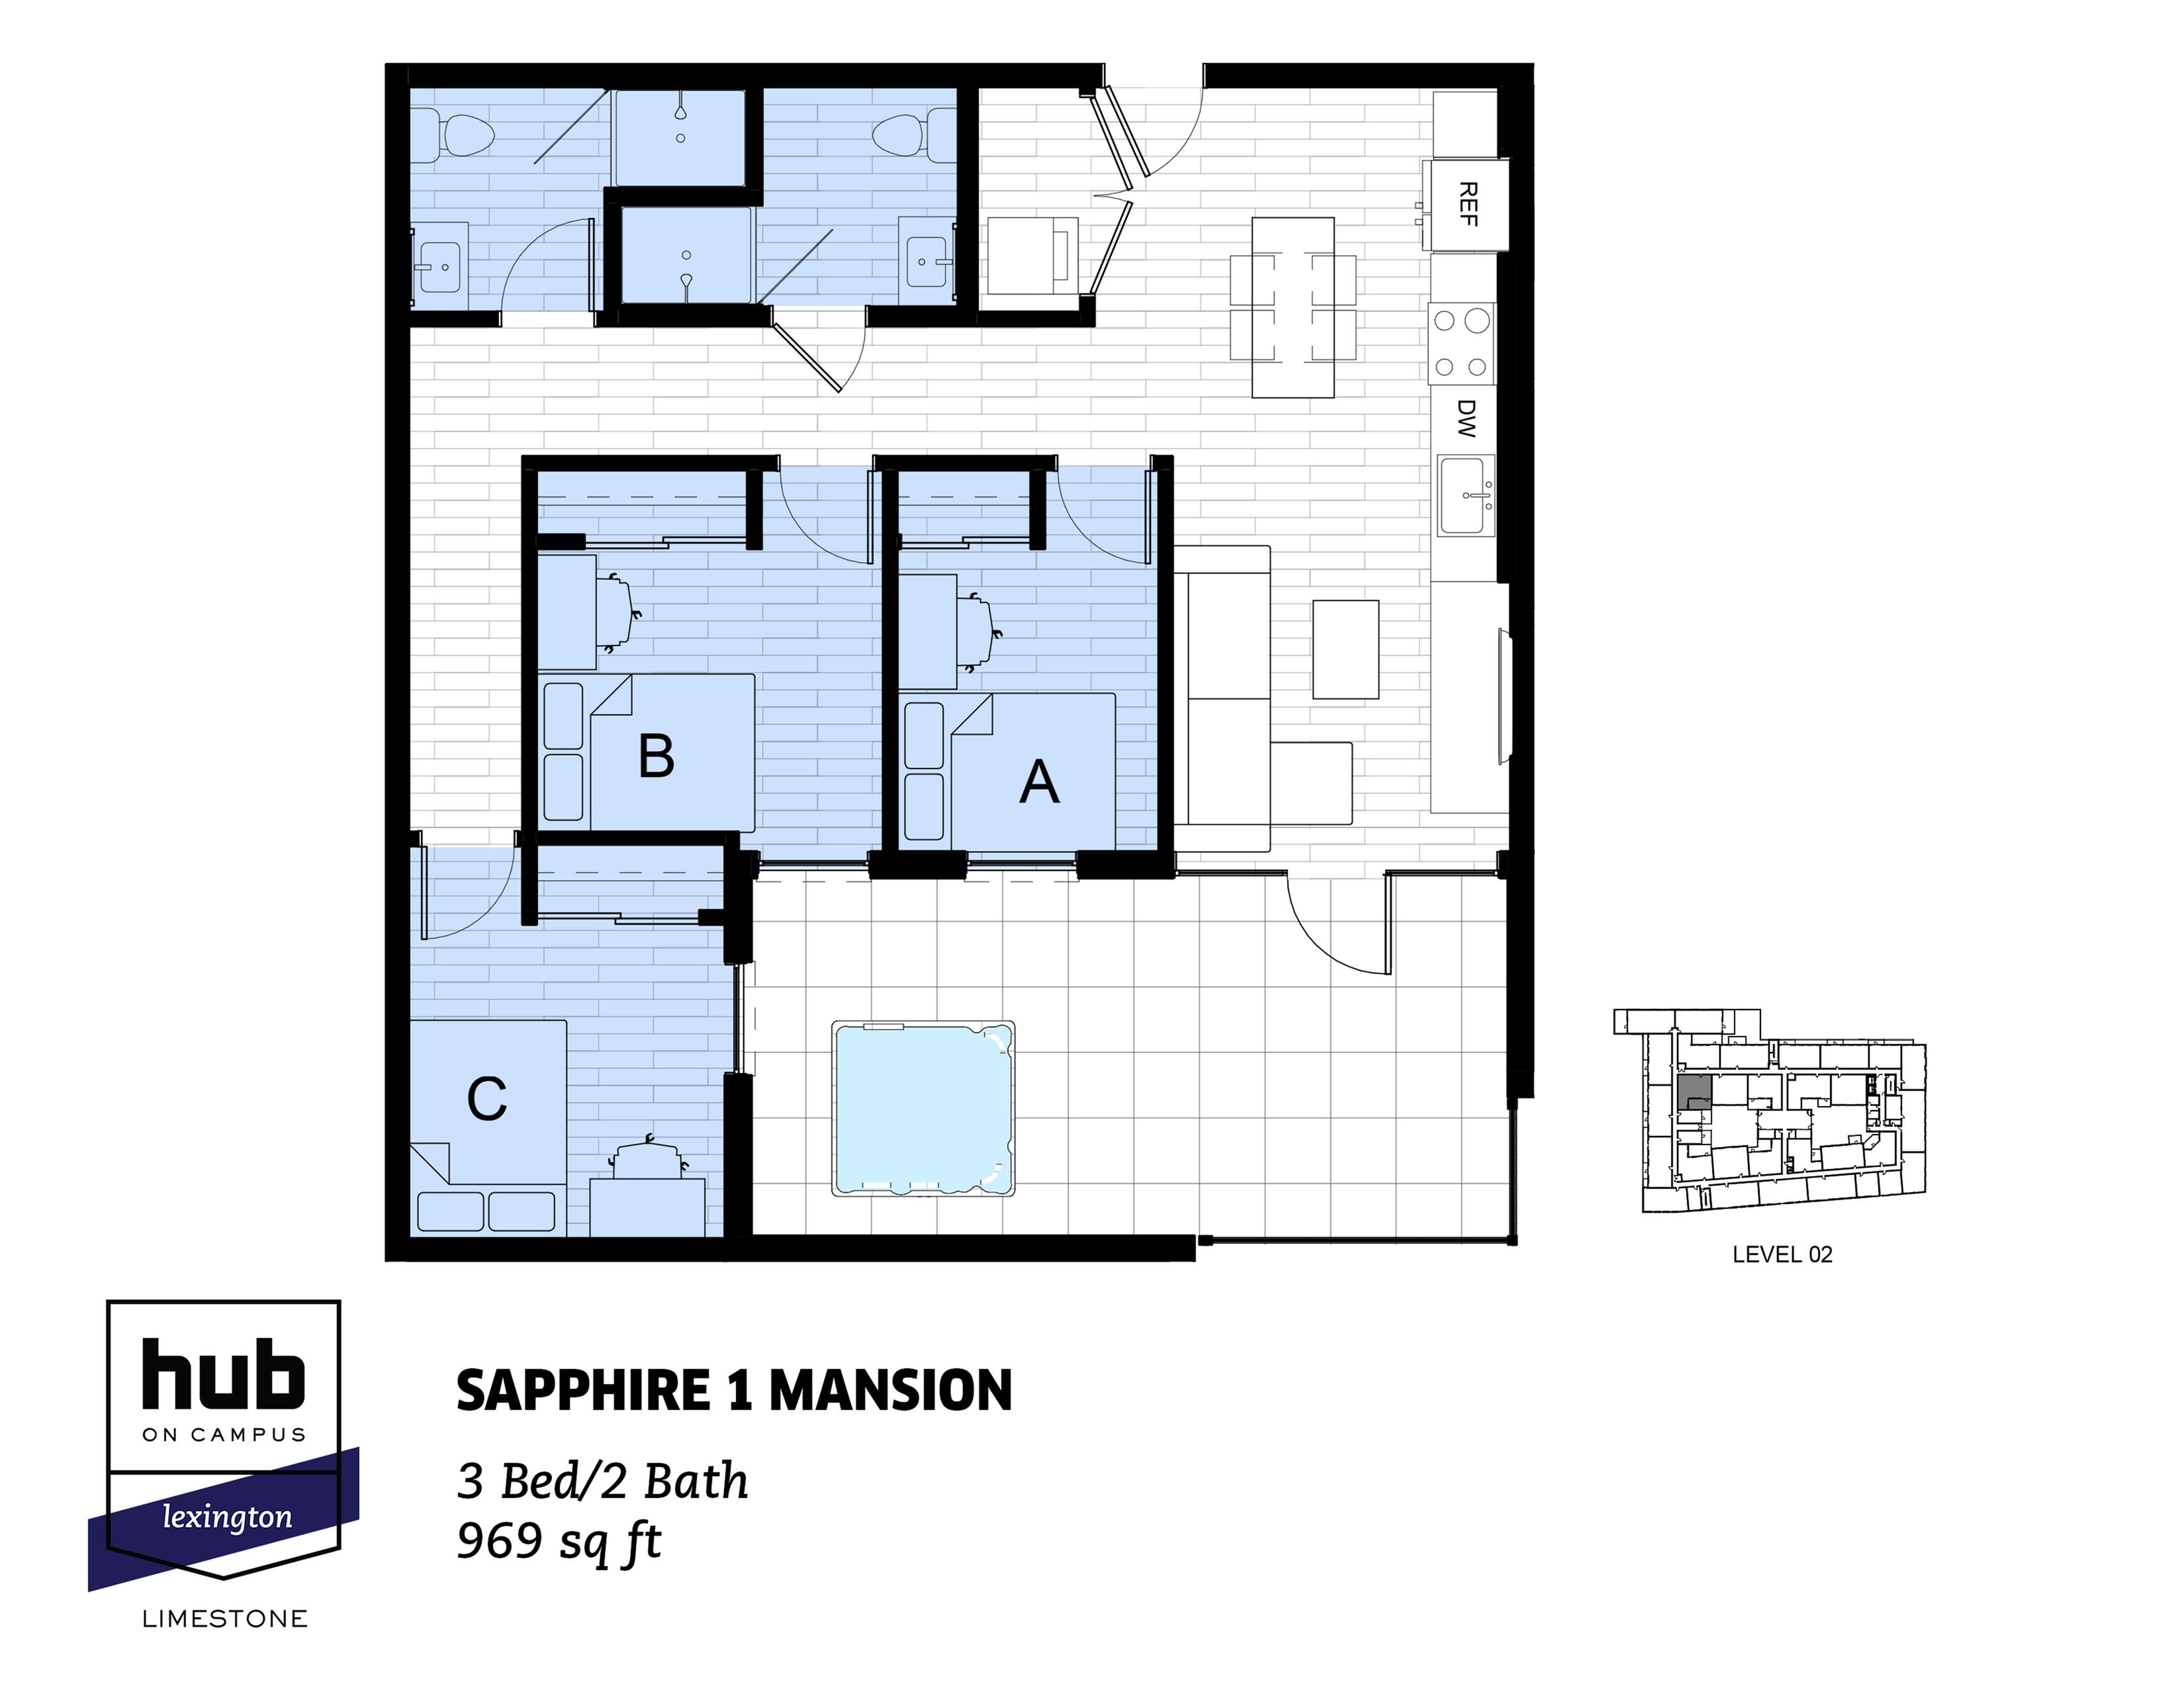 Sapphire 1 Mansion